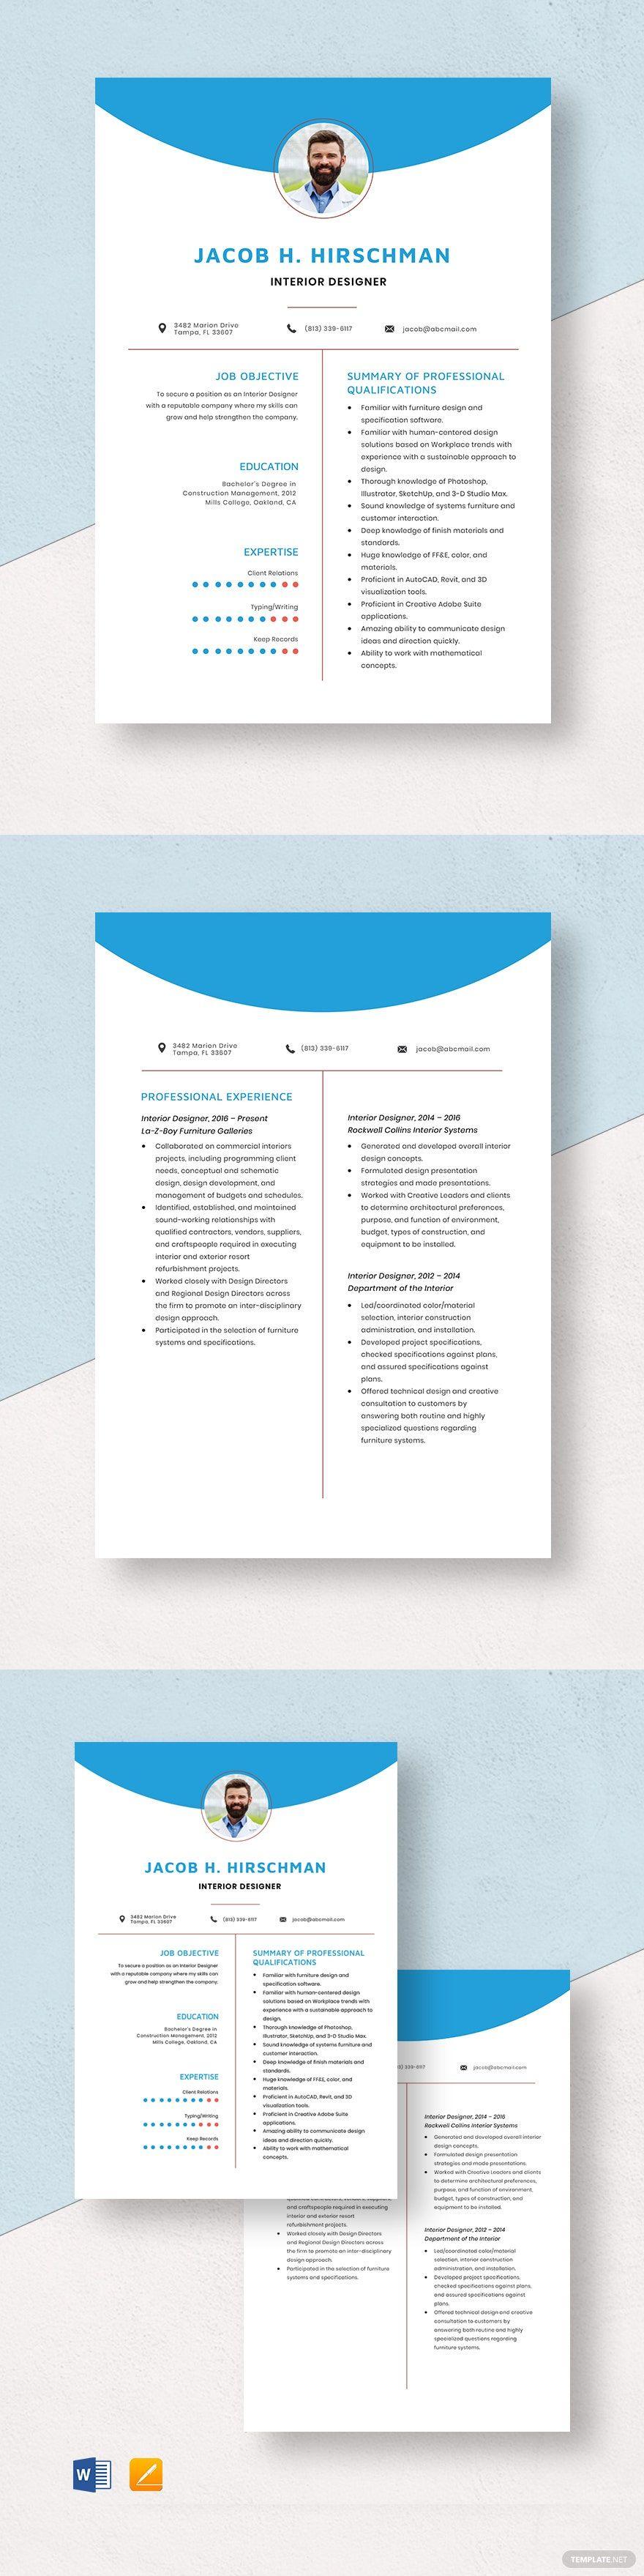 Interior designer resumecv template word apple pages